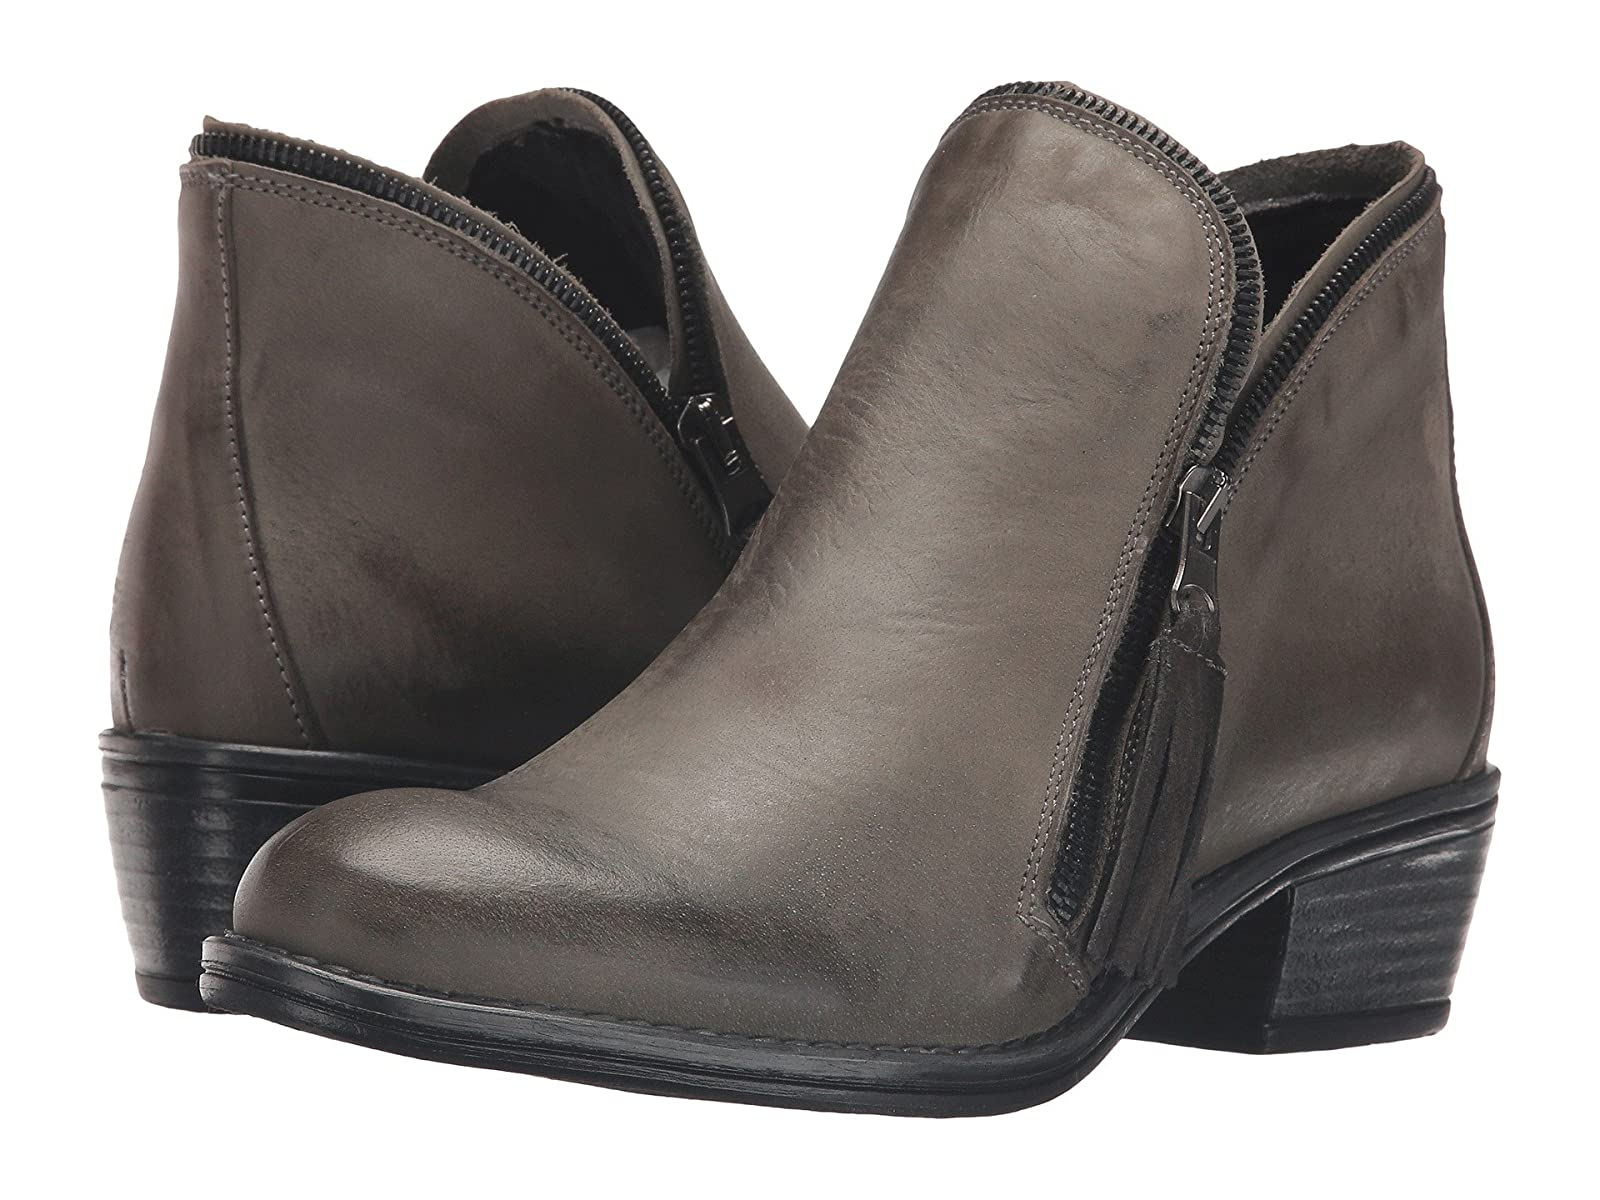 Eric Michael BarcelonaCheap and distinctive eye-catching shoes